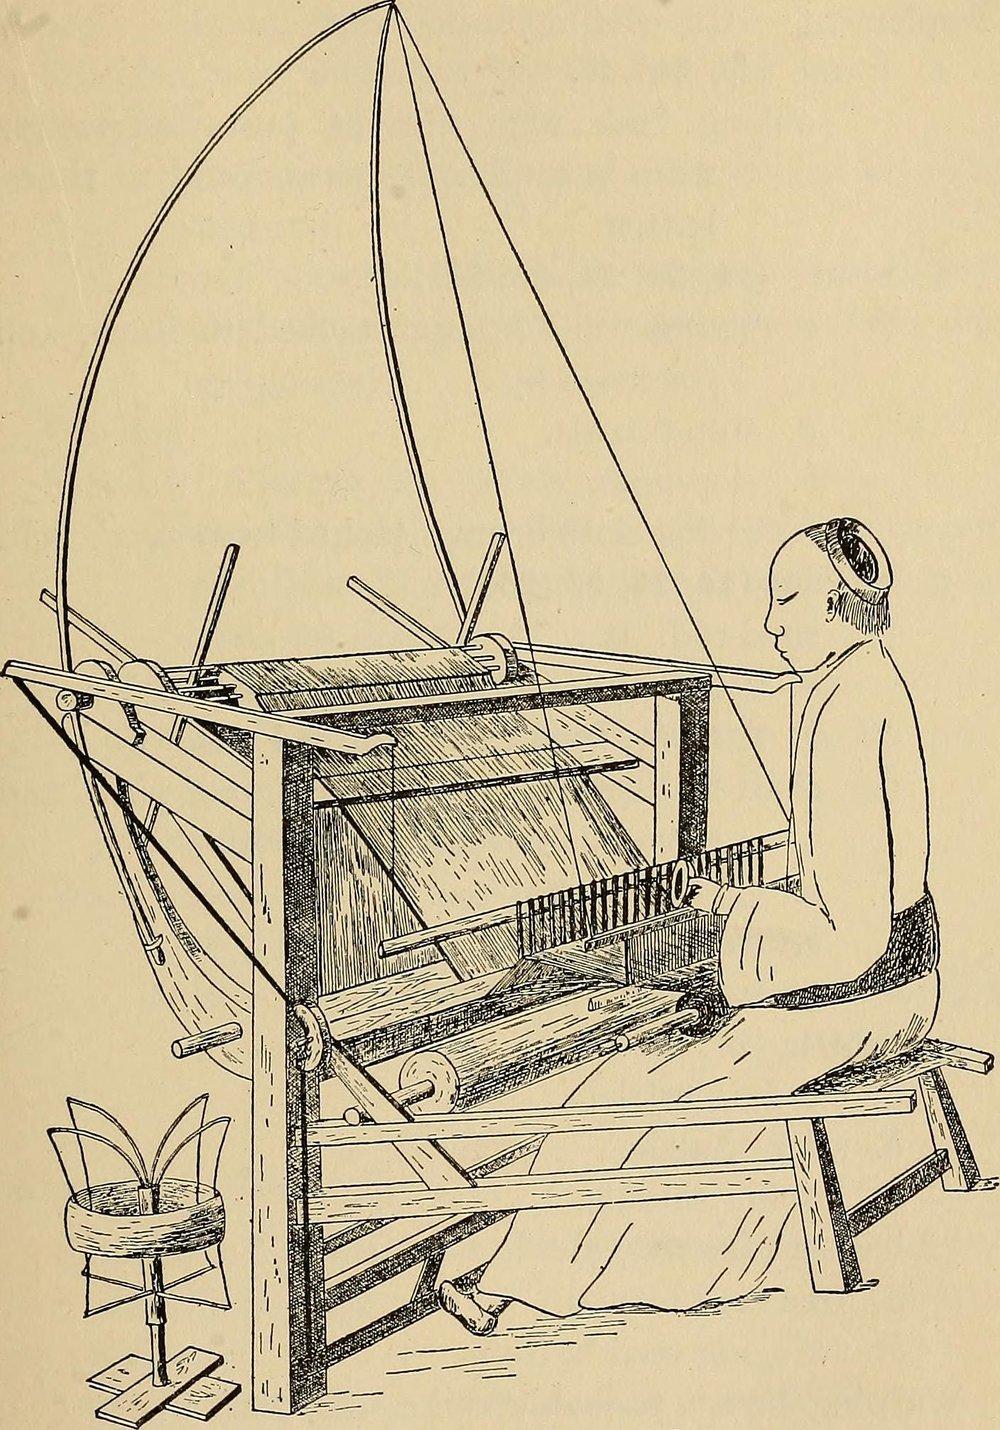 Type 2 of treadle loom: single-heald and two-treadle loom